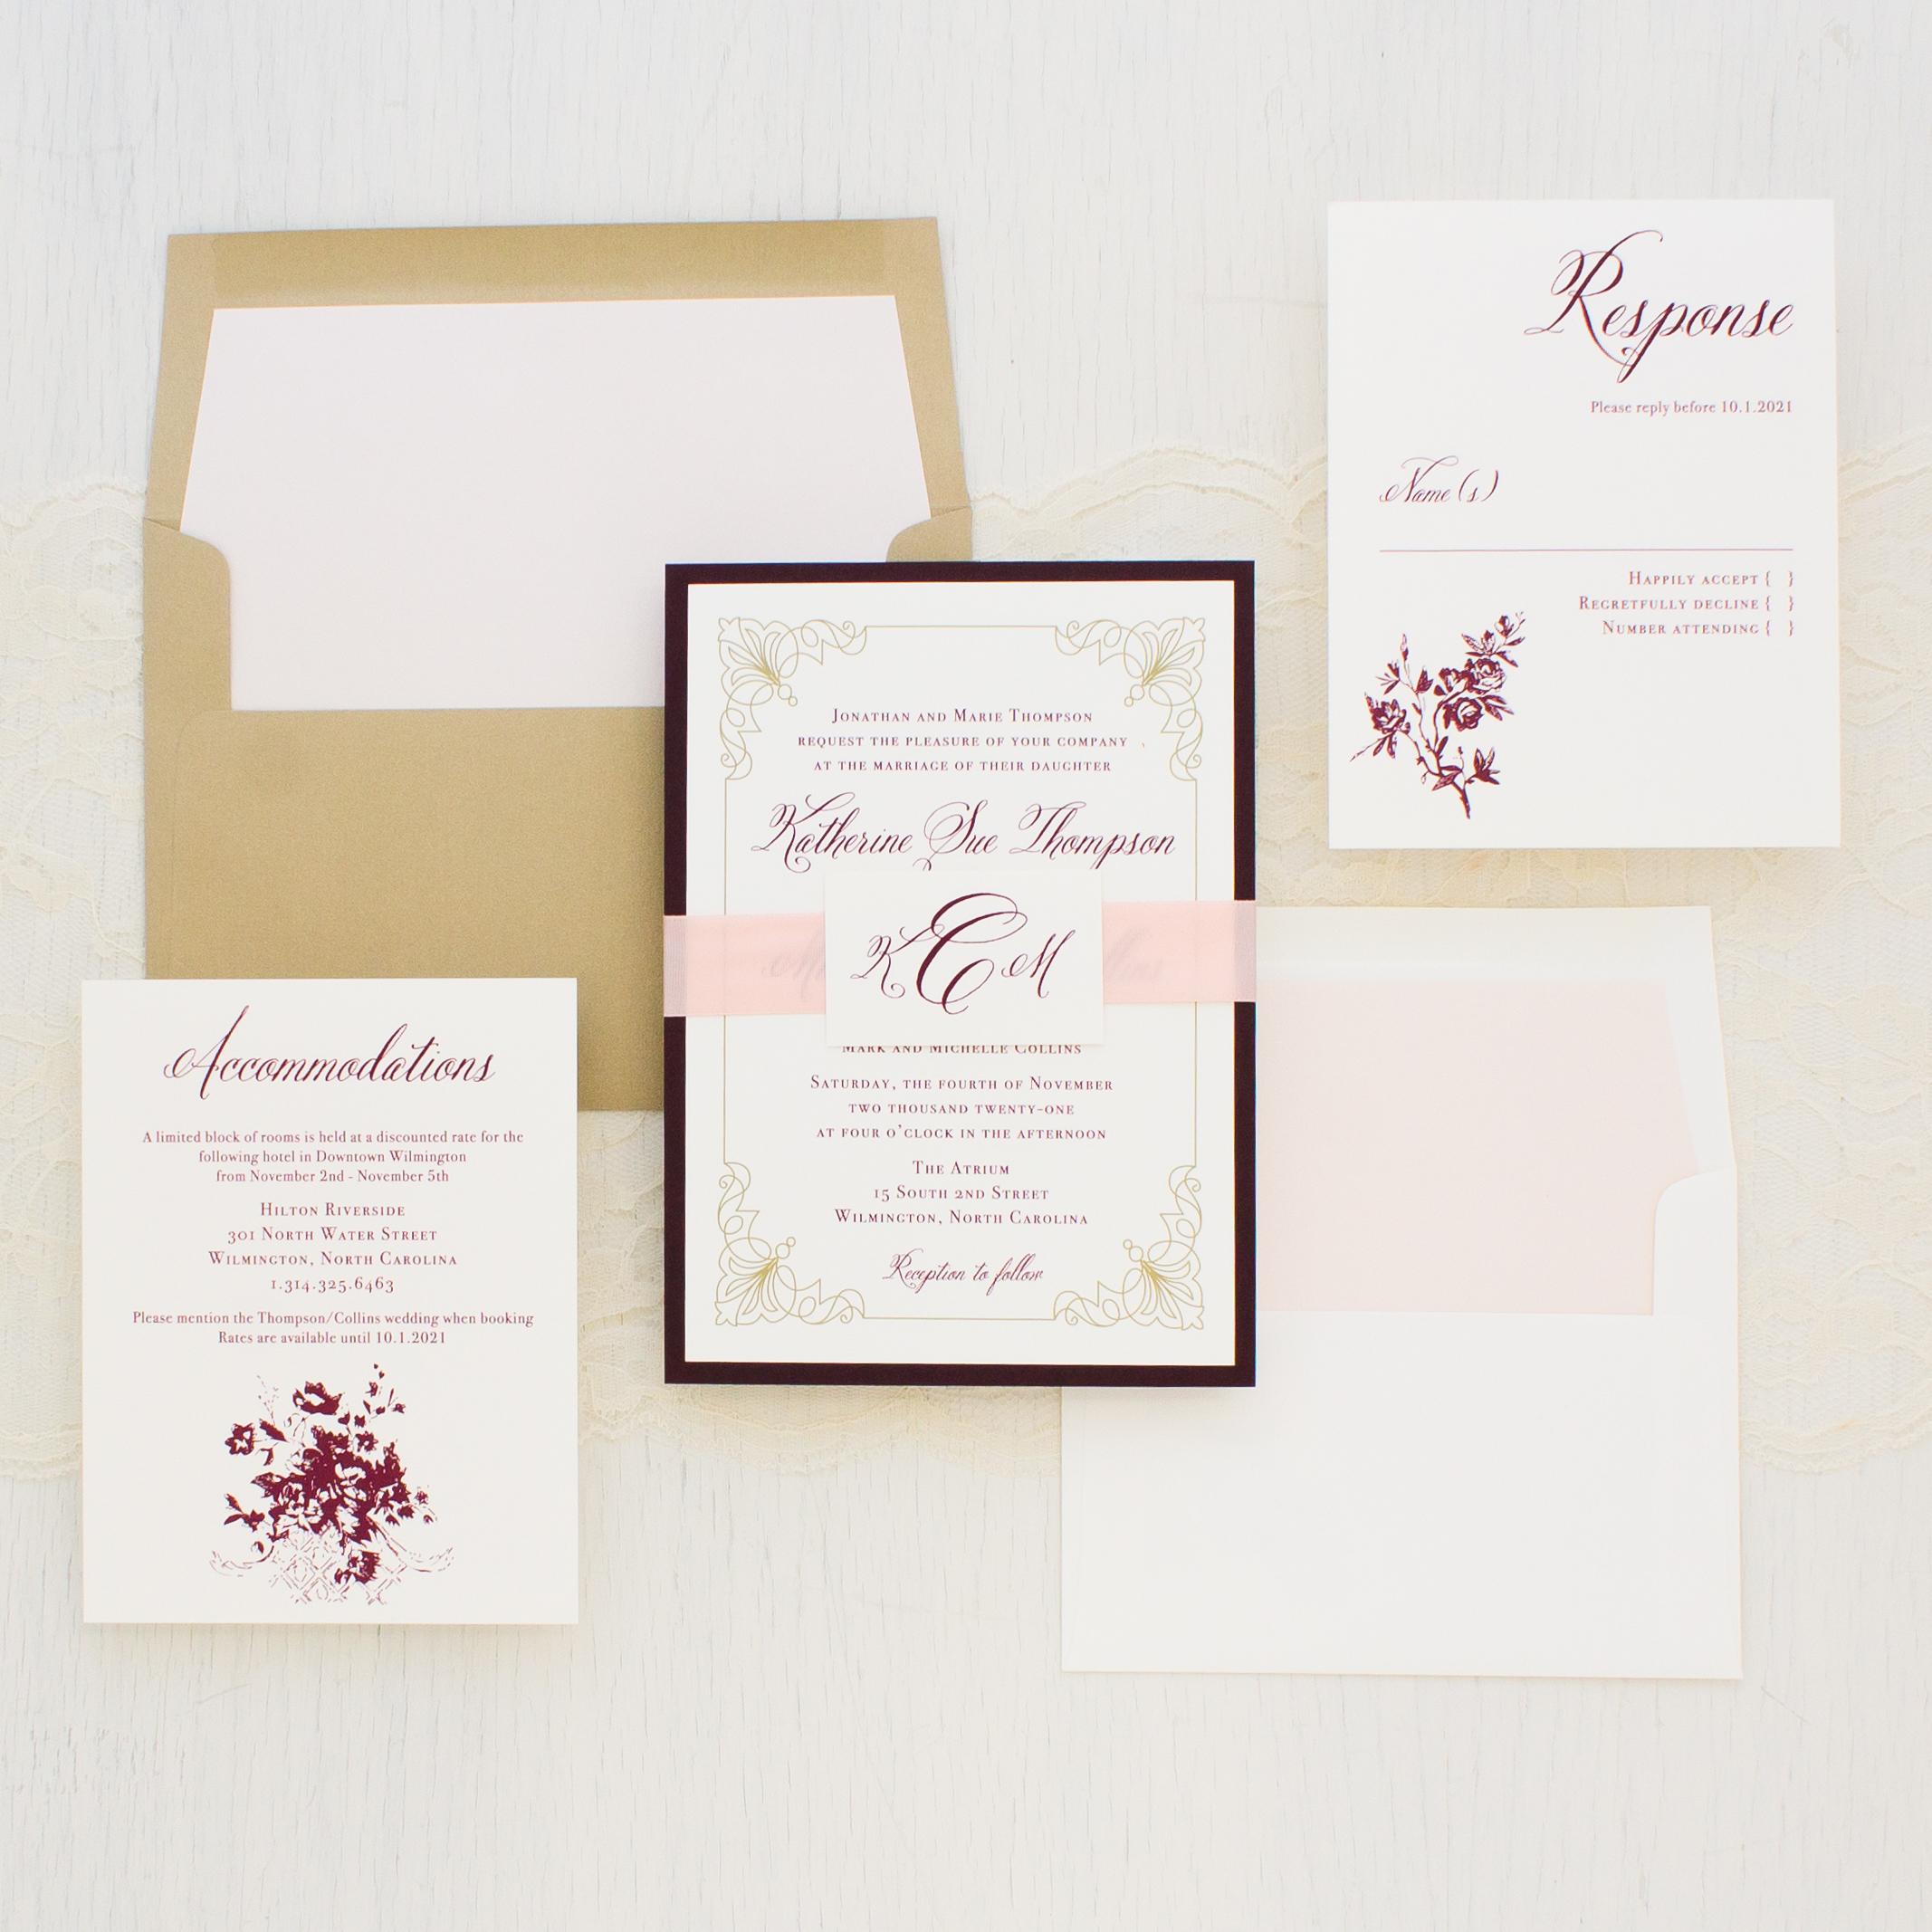 Gold Wedding Invitations: Classic Burgundy & Gold Wedding Invitations